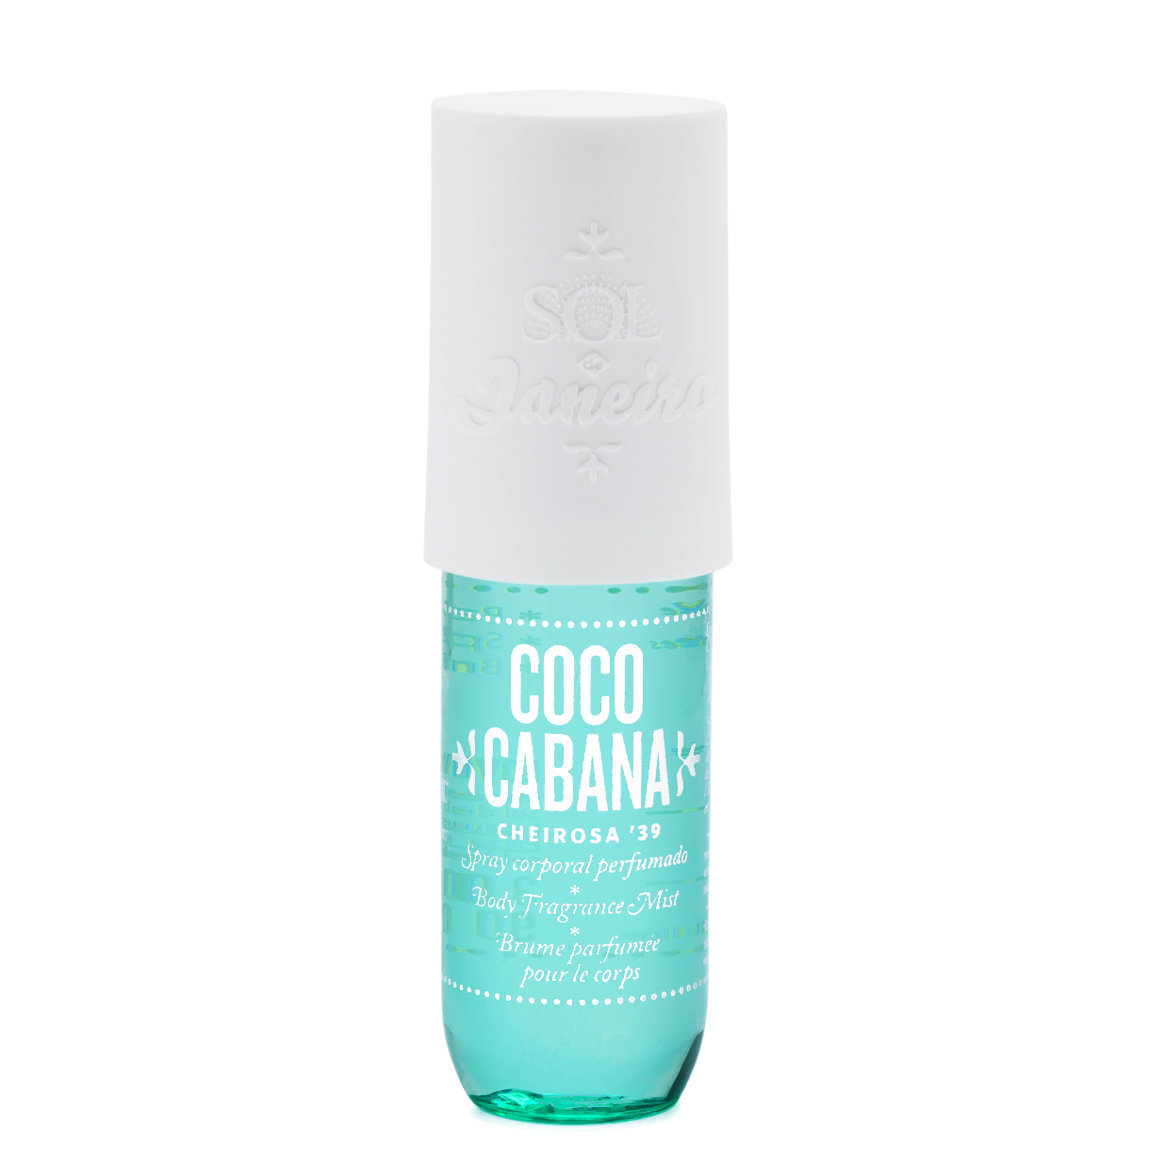 Sol de Janeiro Coco Cabana Fragrance Body Mist product swatch.